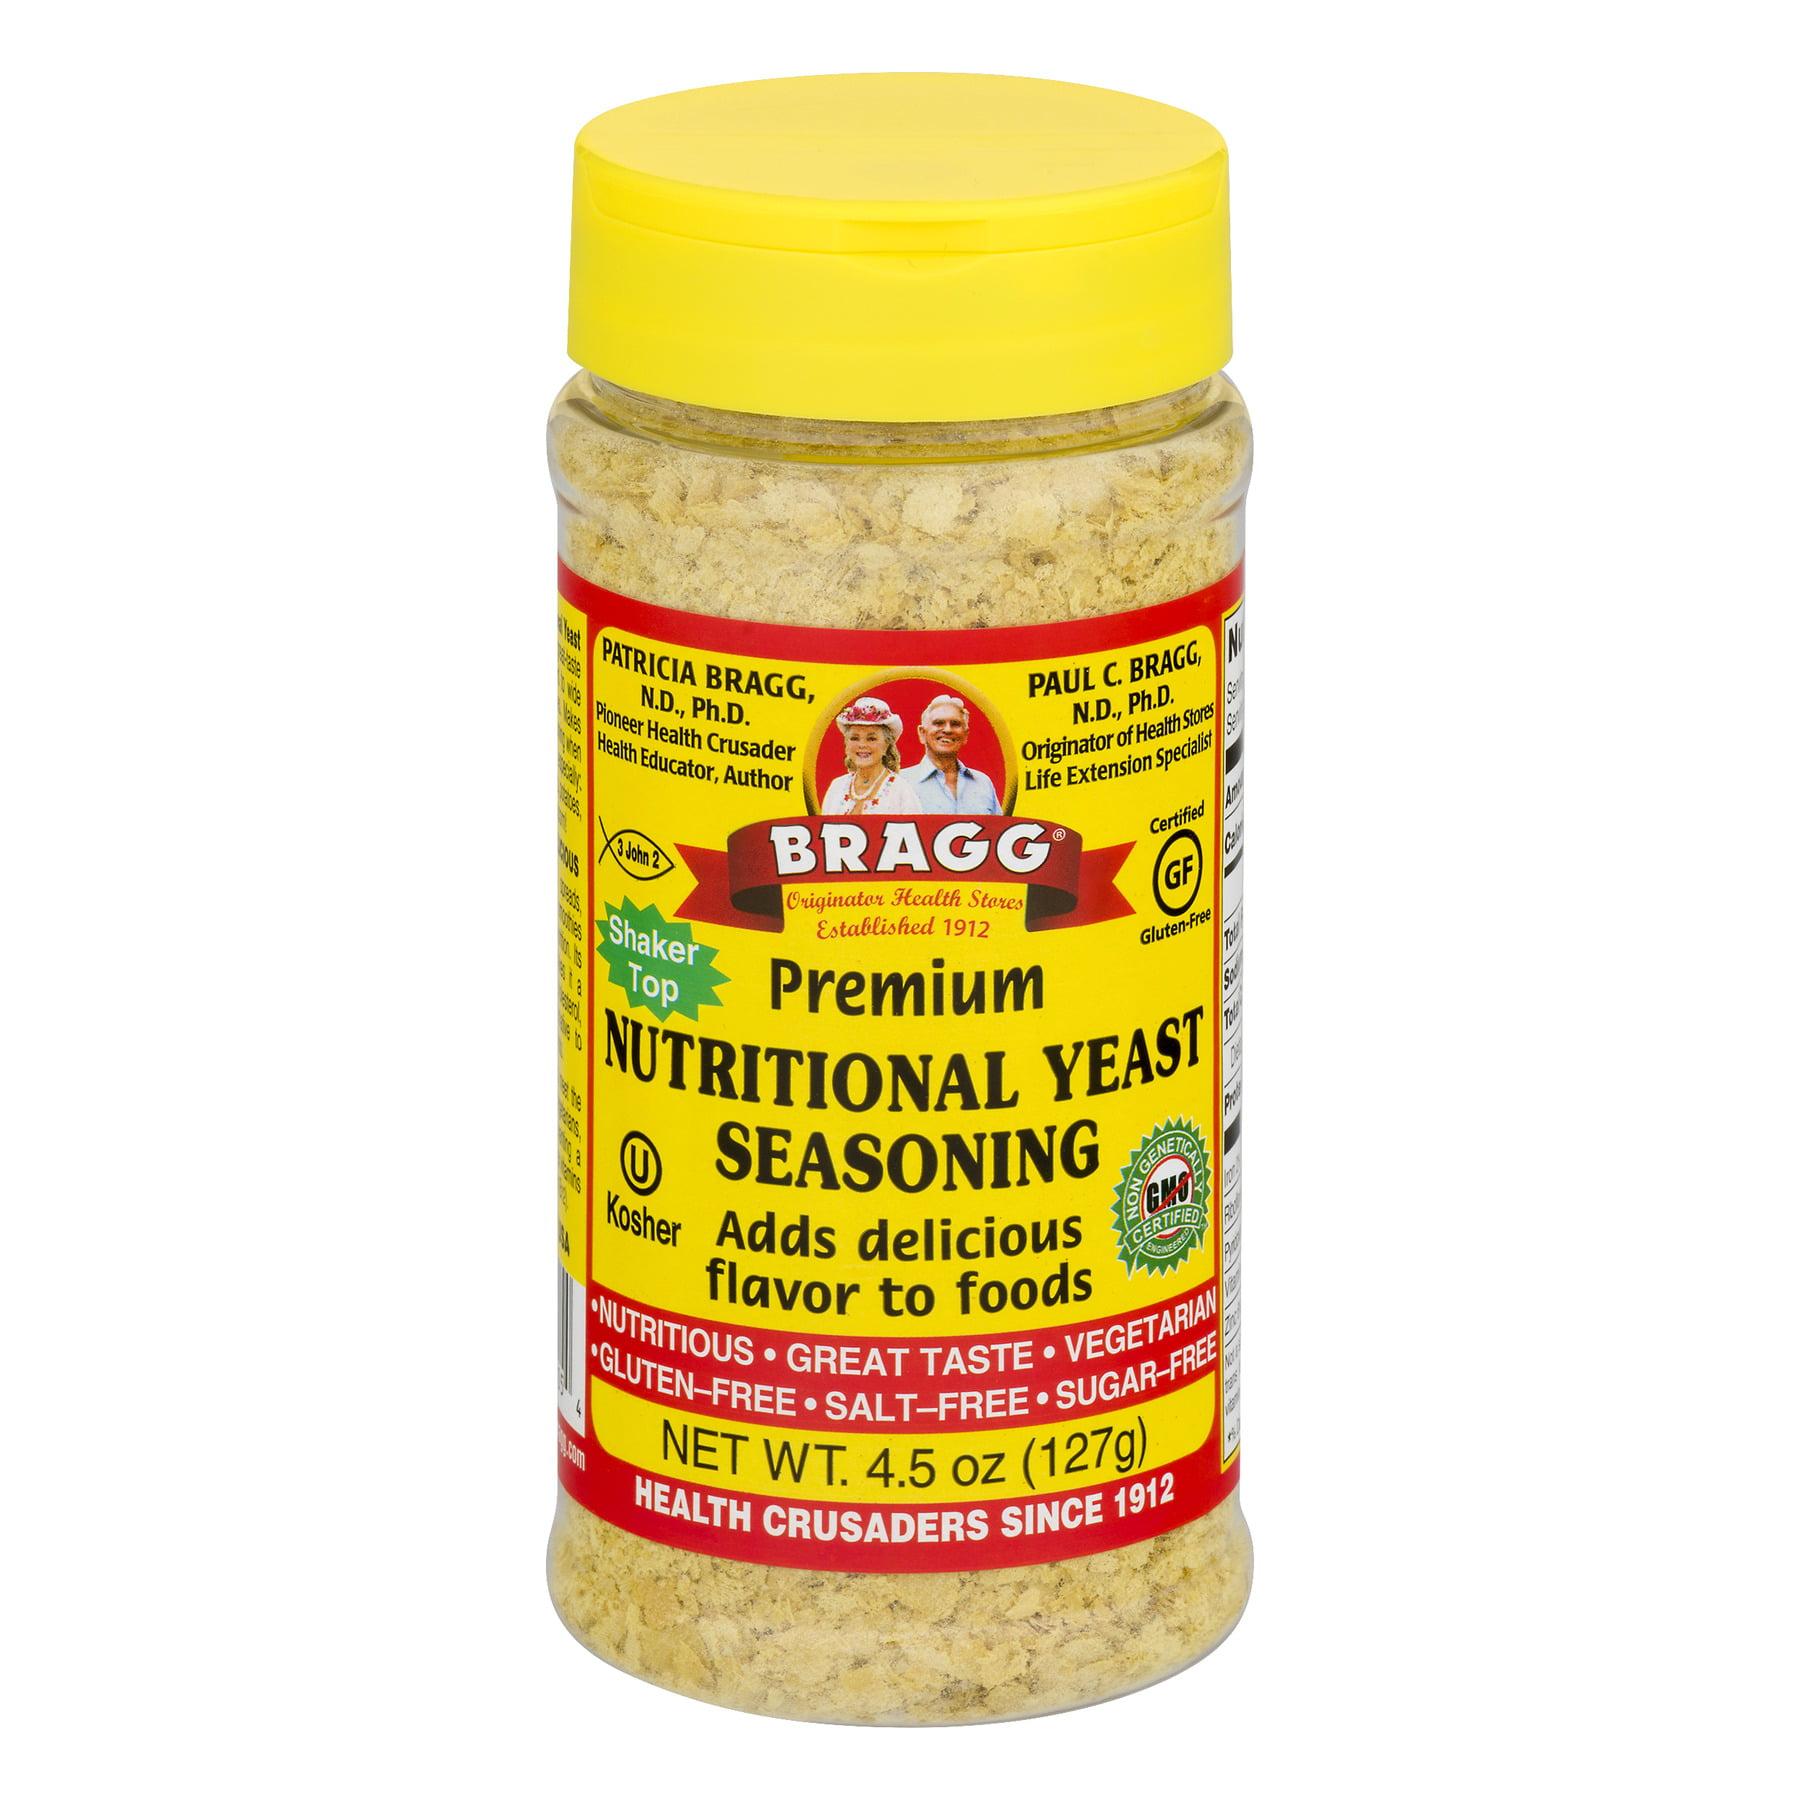 Bragg Premium Nutritional Yeast Seasoning, 4.5 OZ